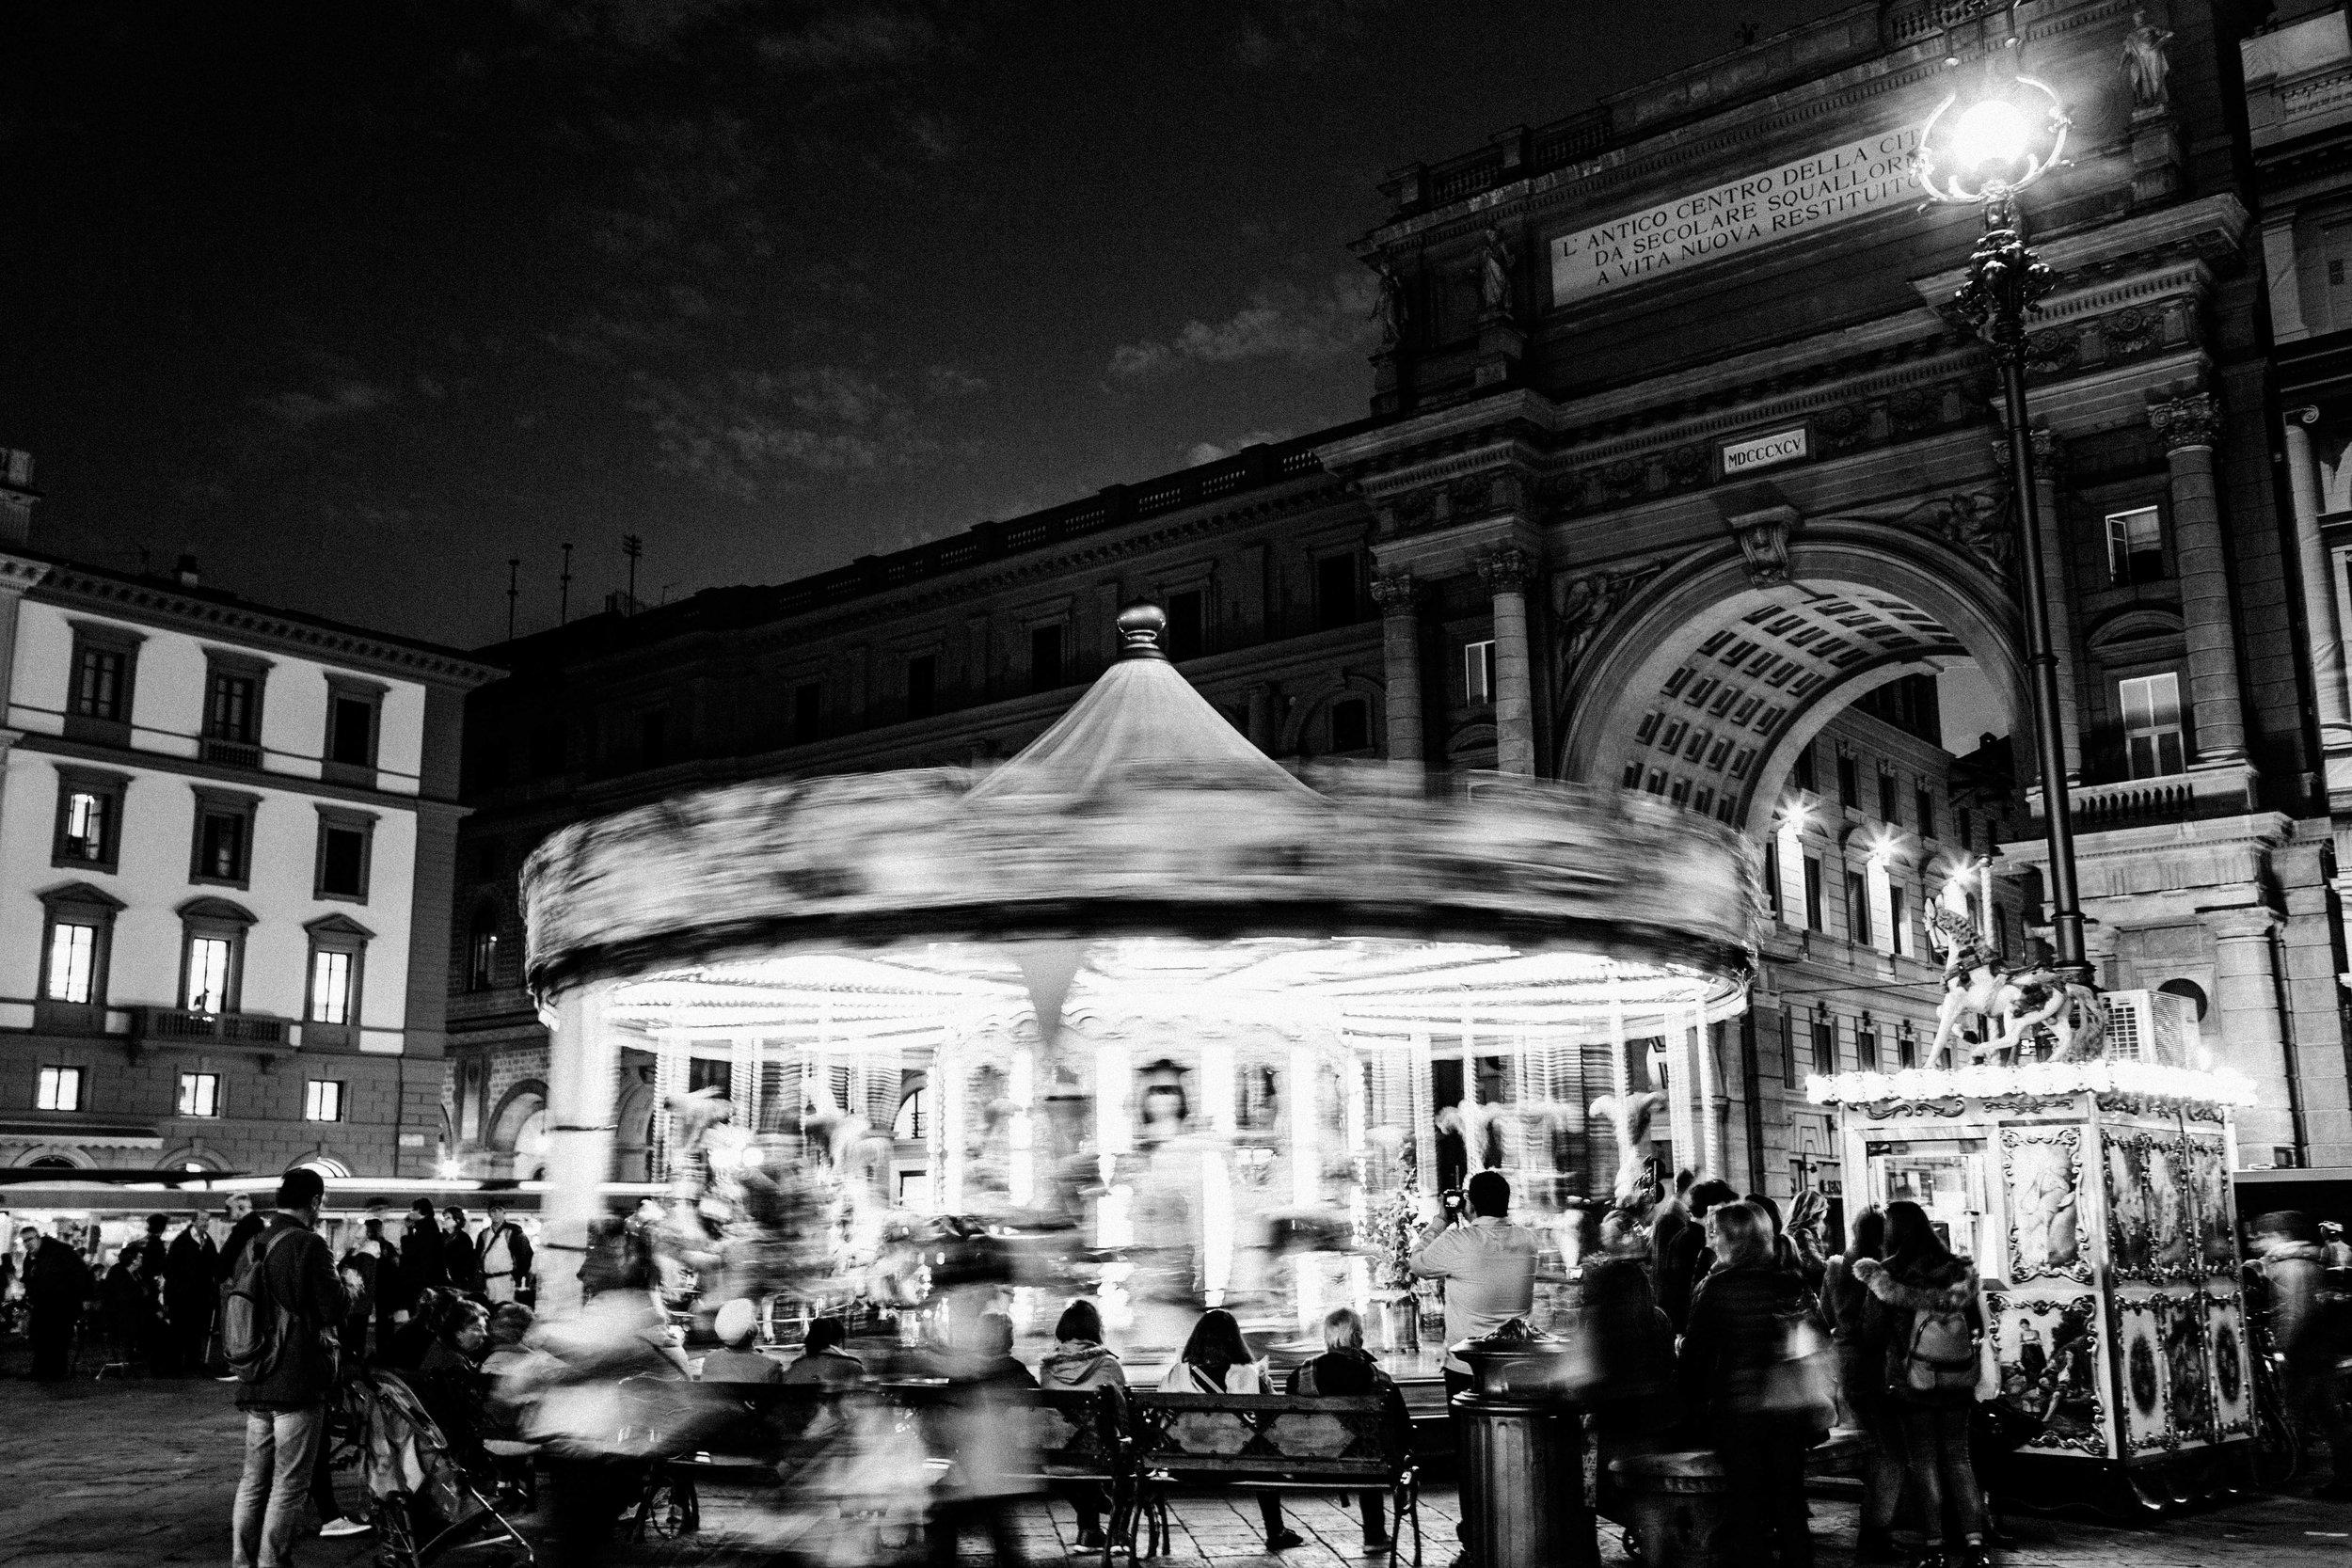 ITALY2015-191-67.jpg